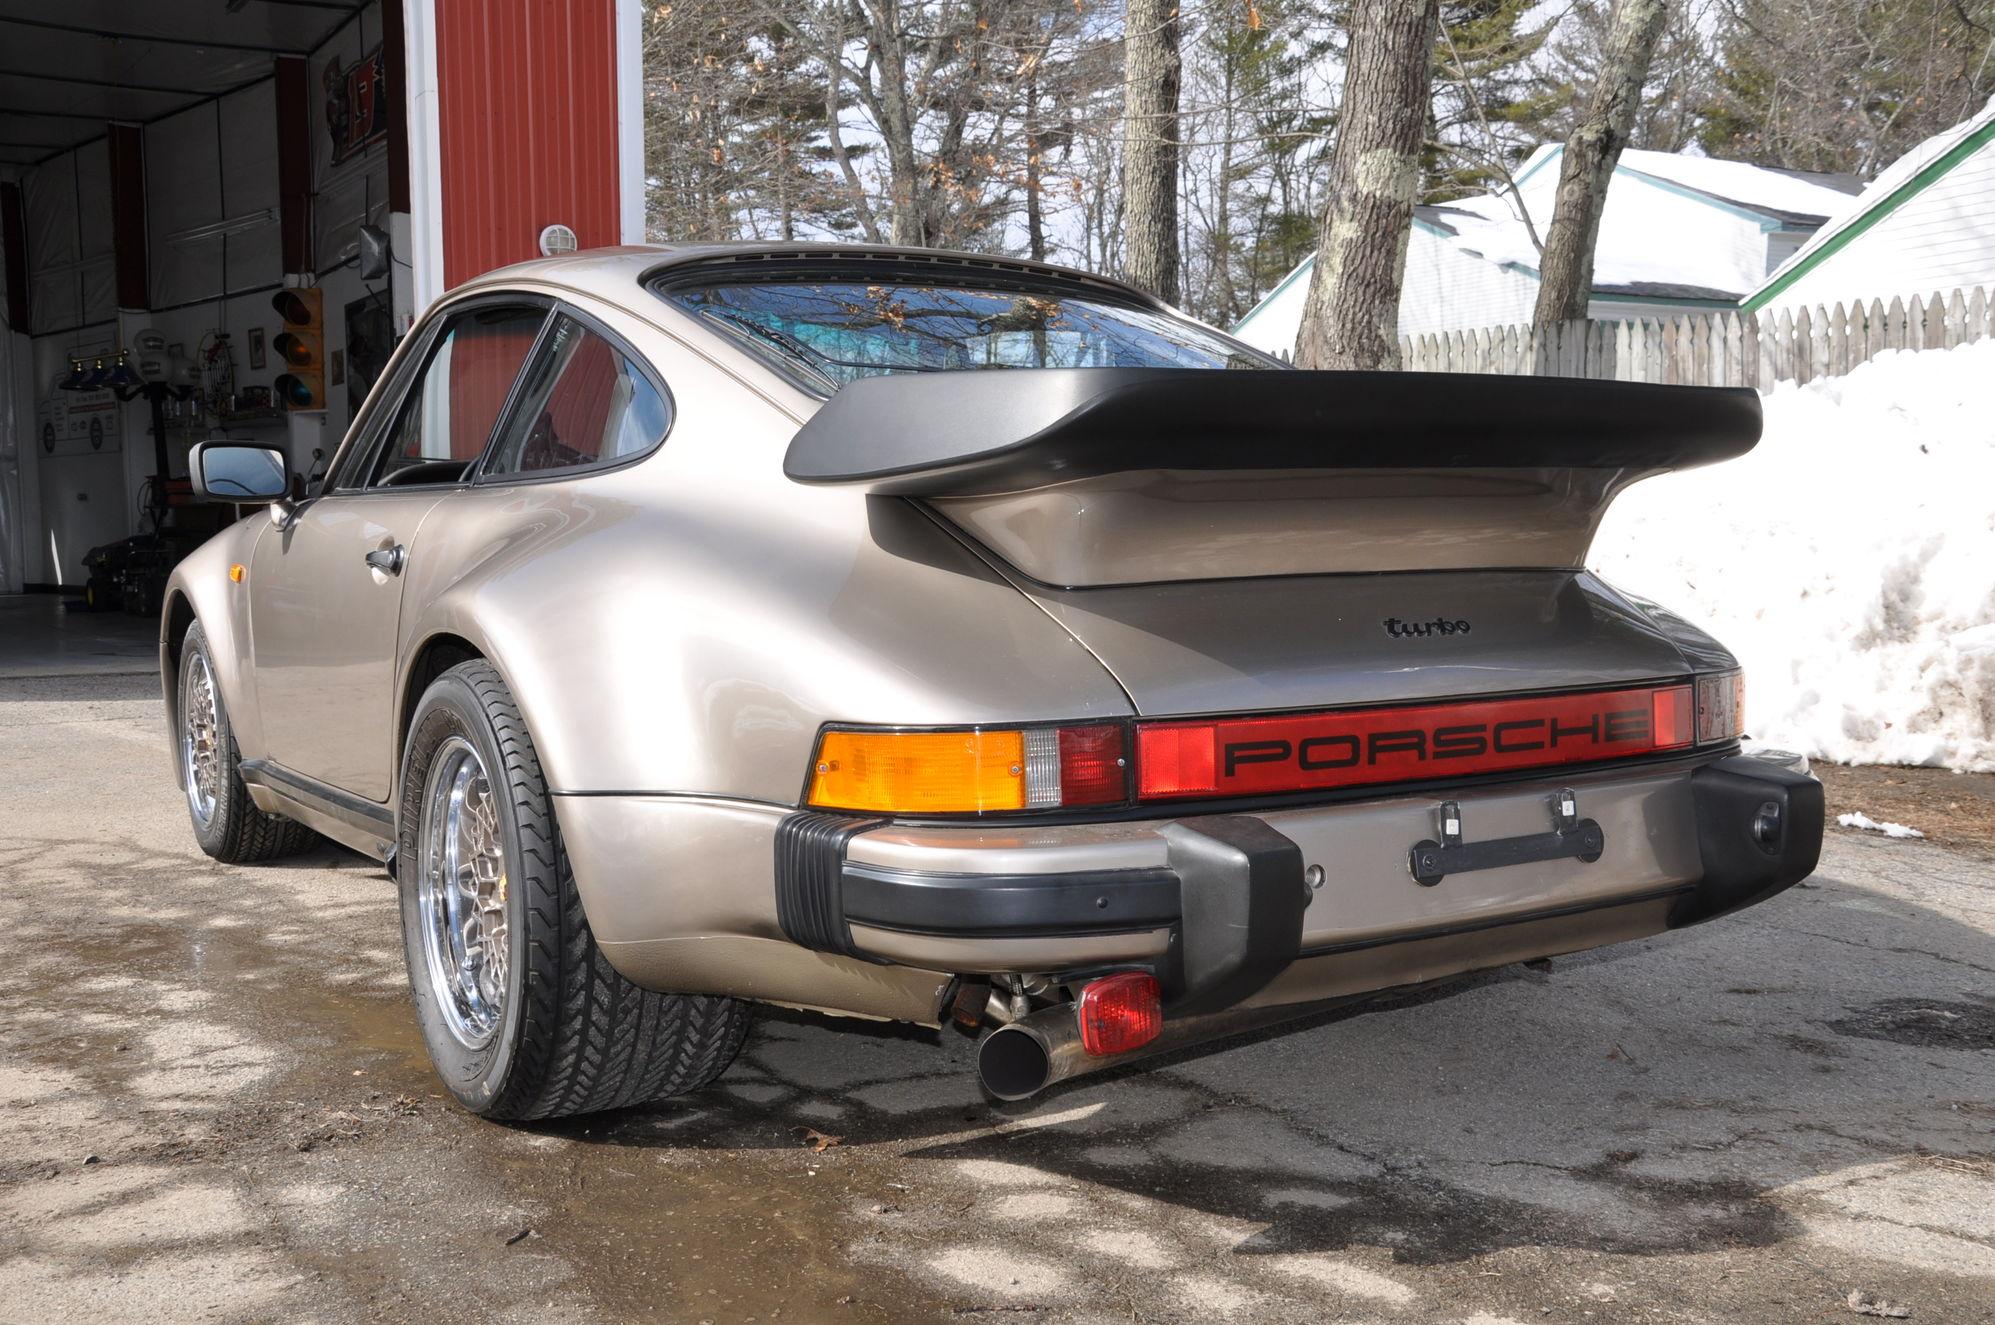 1983 german import porsche 911 turbo k28 turbo 19k original miles pelican parts technical bbs. Black Bedroom Furniture Sets. Home Design Ideas